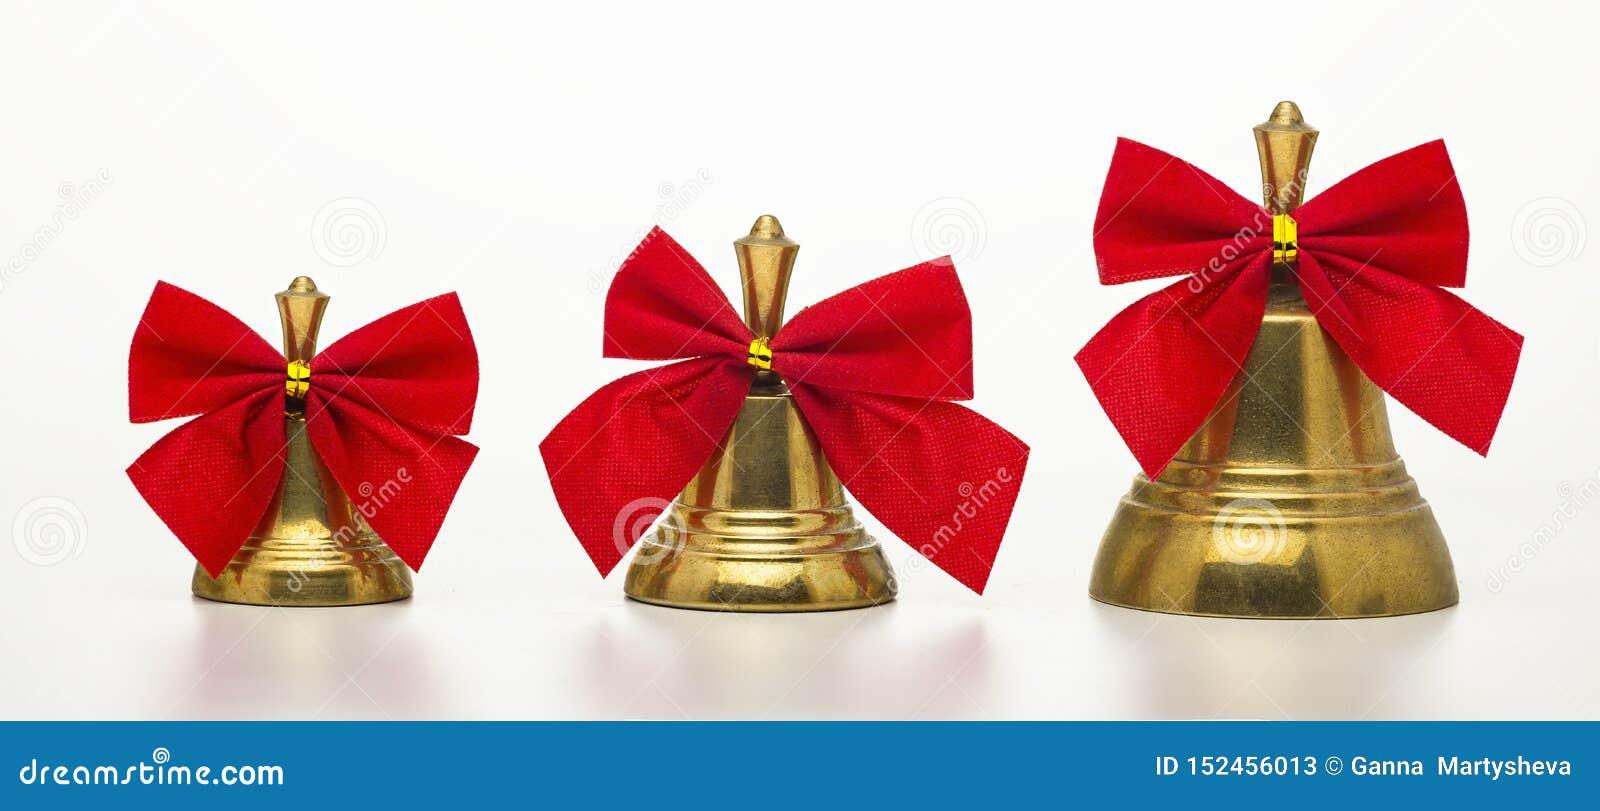 Christmas Bells Images Clip Art.Christmas Bell Merry Christmas Christmas Bell Foto